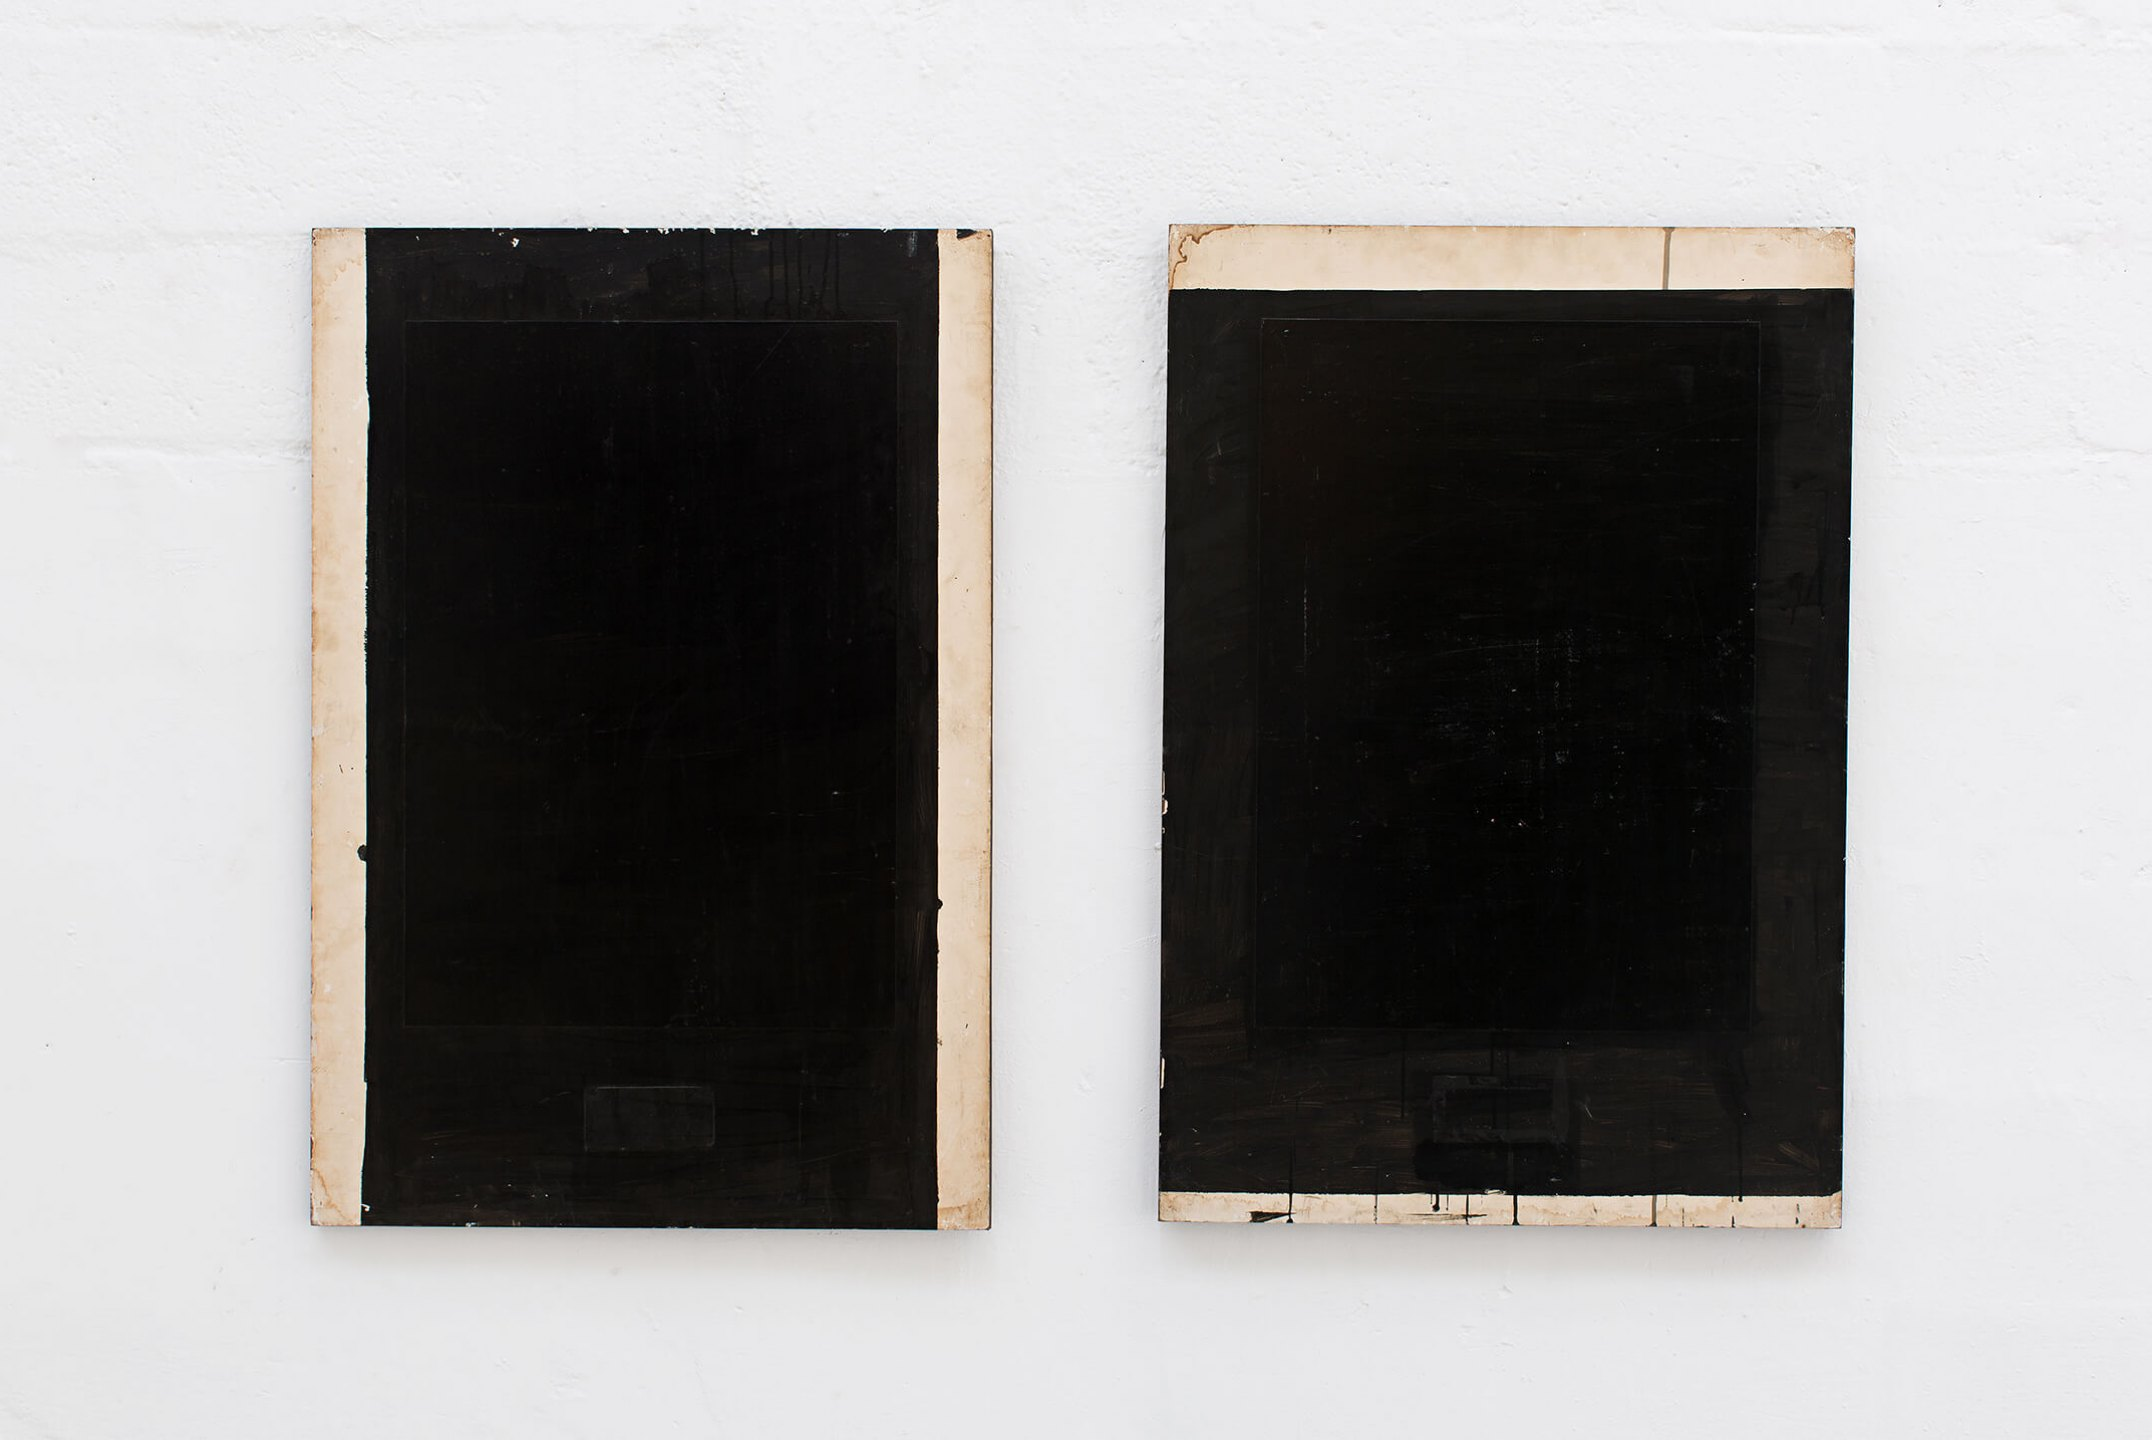 Deyson Gilbert, <em>Díptico</em>, 2008, acrylic on wood, 98 × 67 cm (each) - Mendes Wood DM